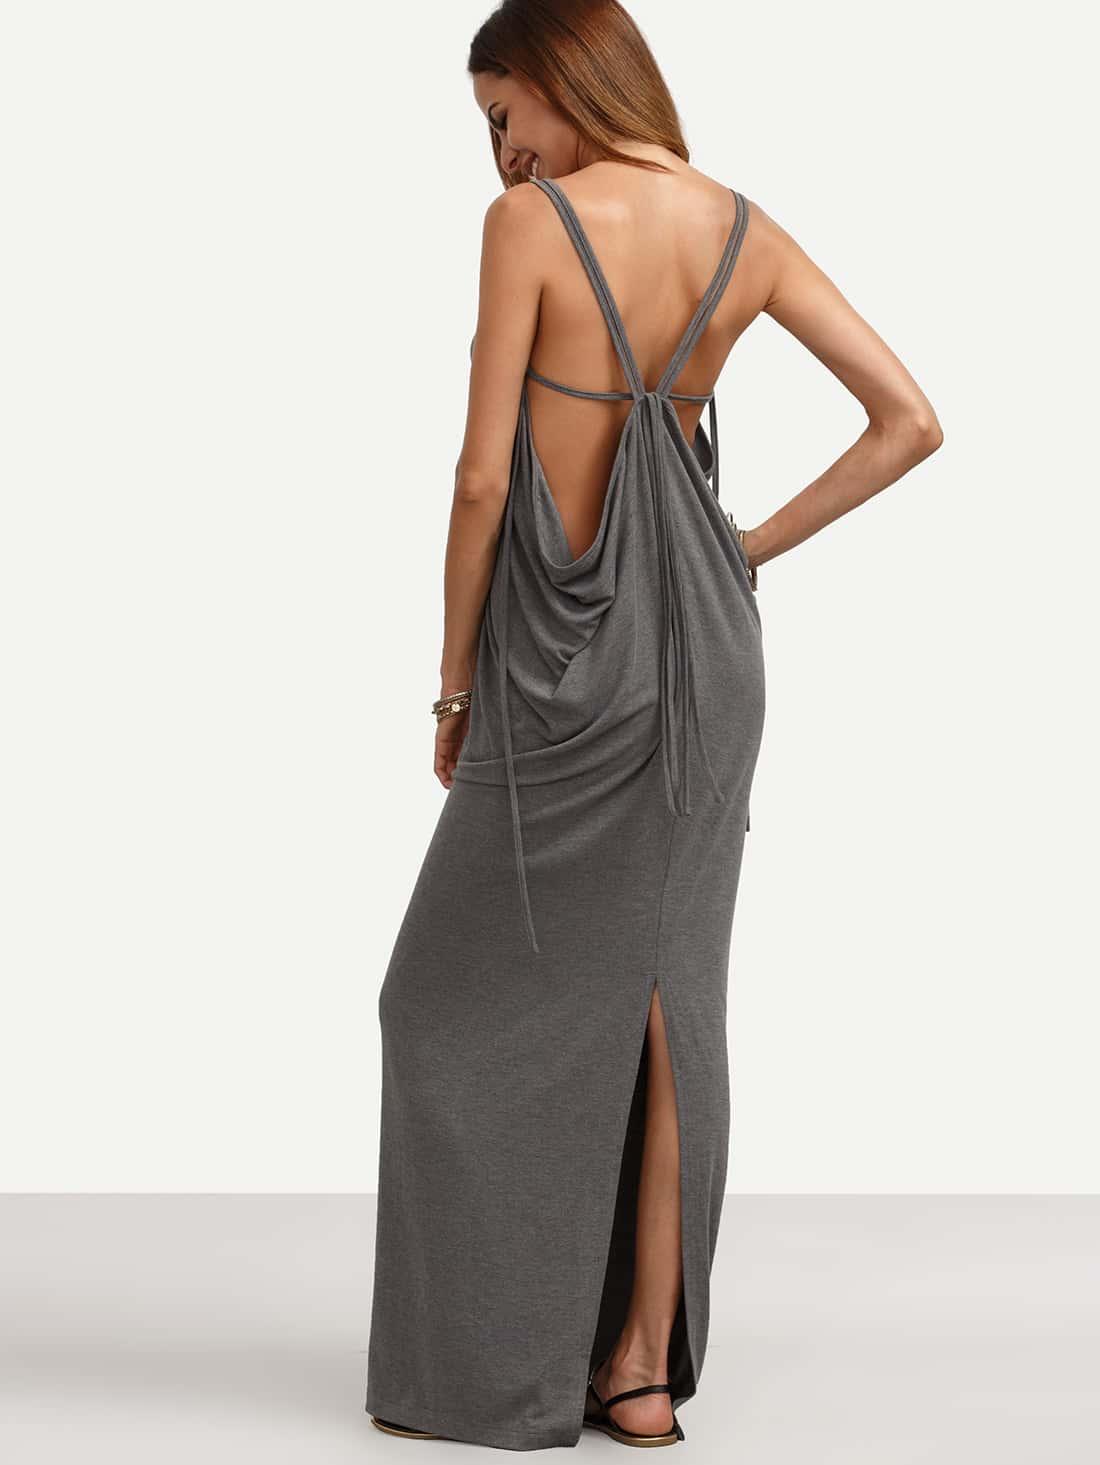 Фото Grey V Neck Backless SStrappy Open Back Split Floor Length Tank Dressplit Maxi Dress. Купить с доставкой